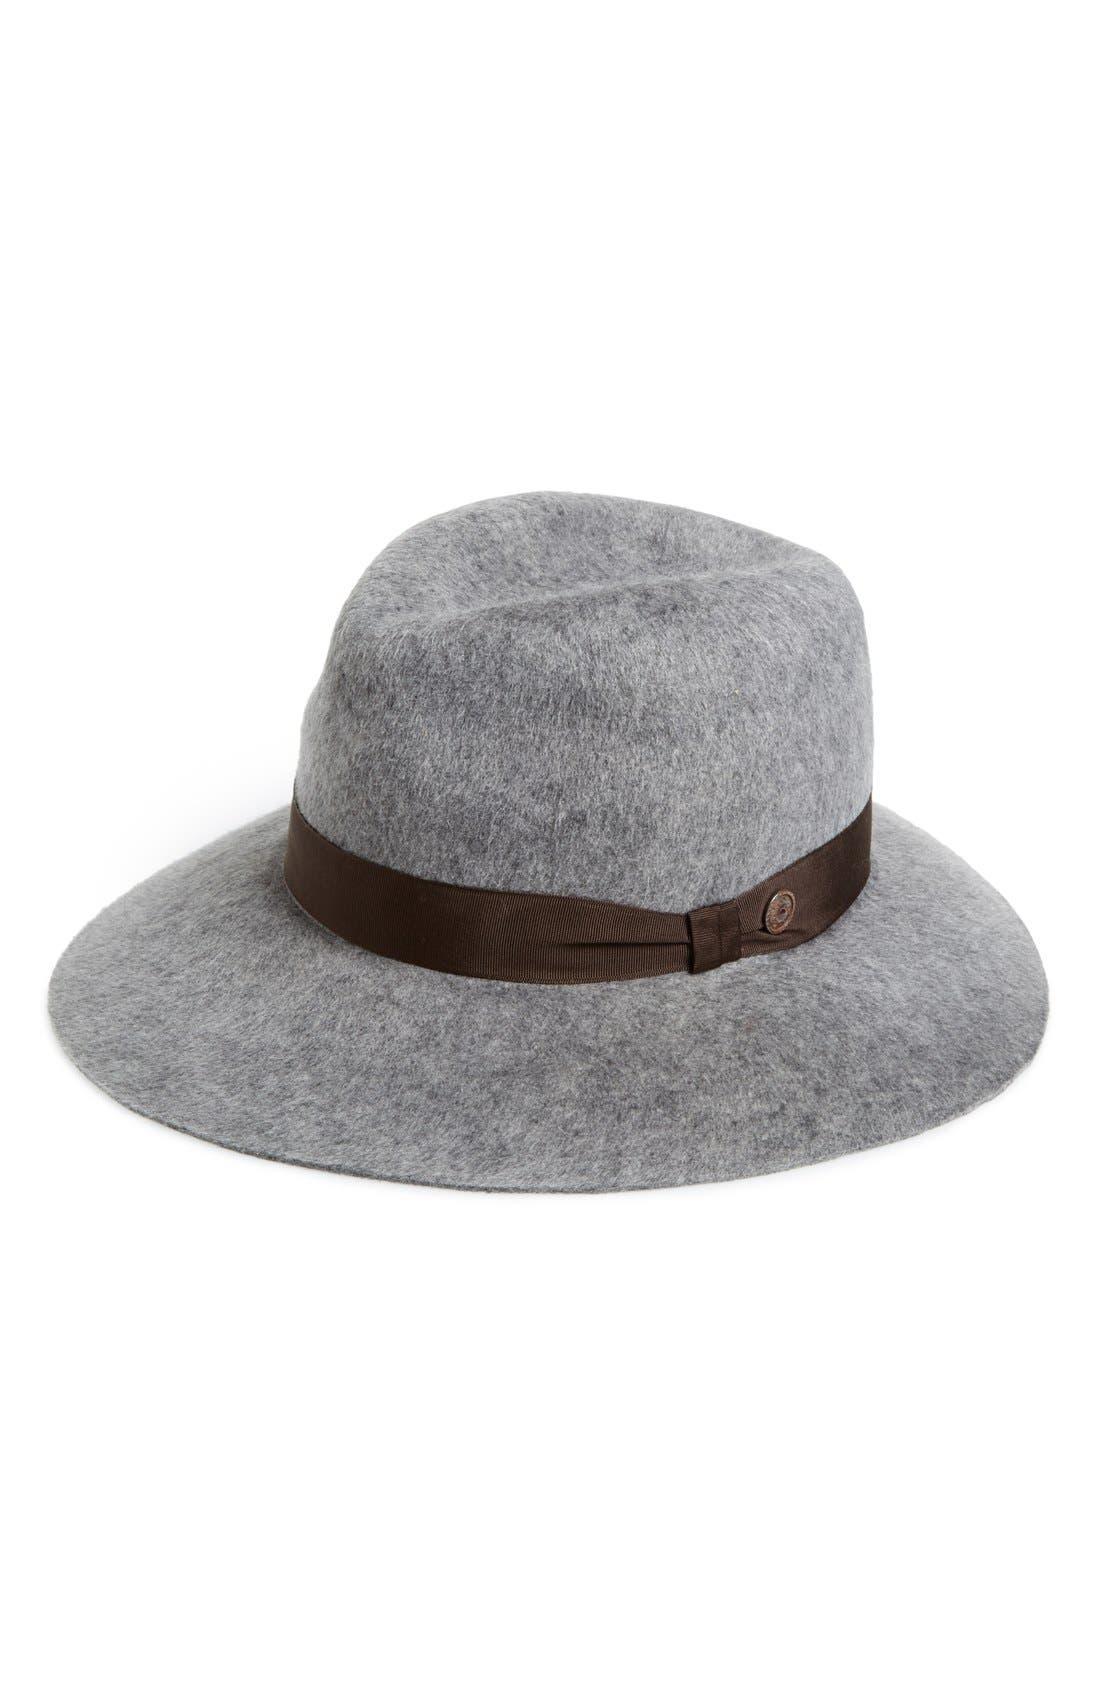 Main Image - Grace Hats 'Shag' Wide Brim Wool Hat